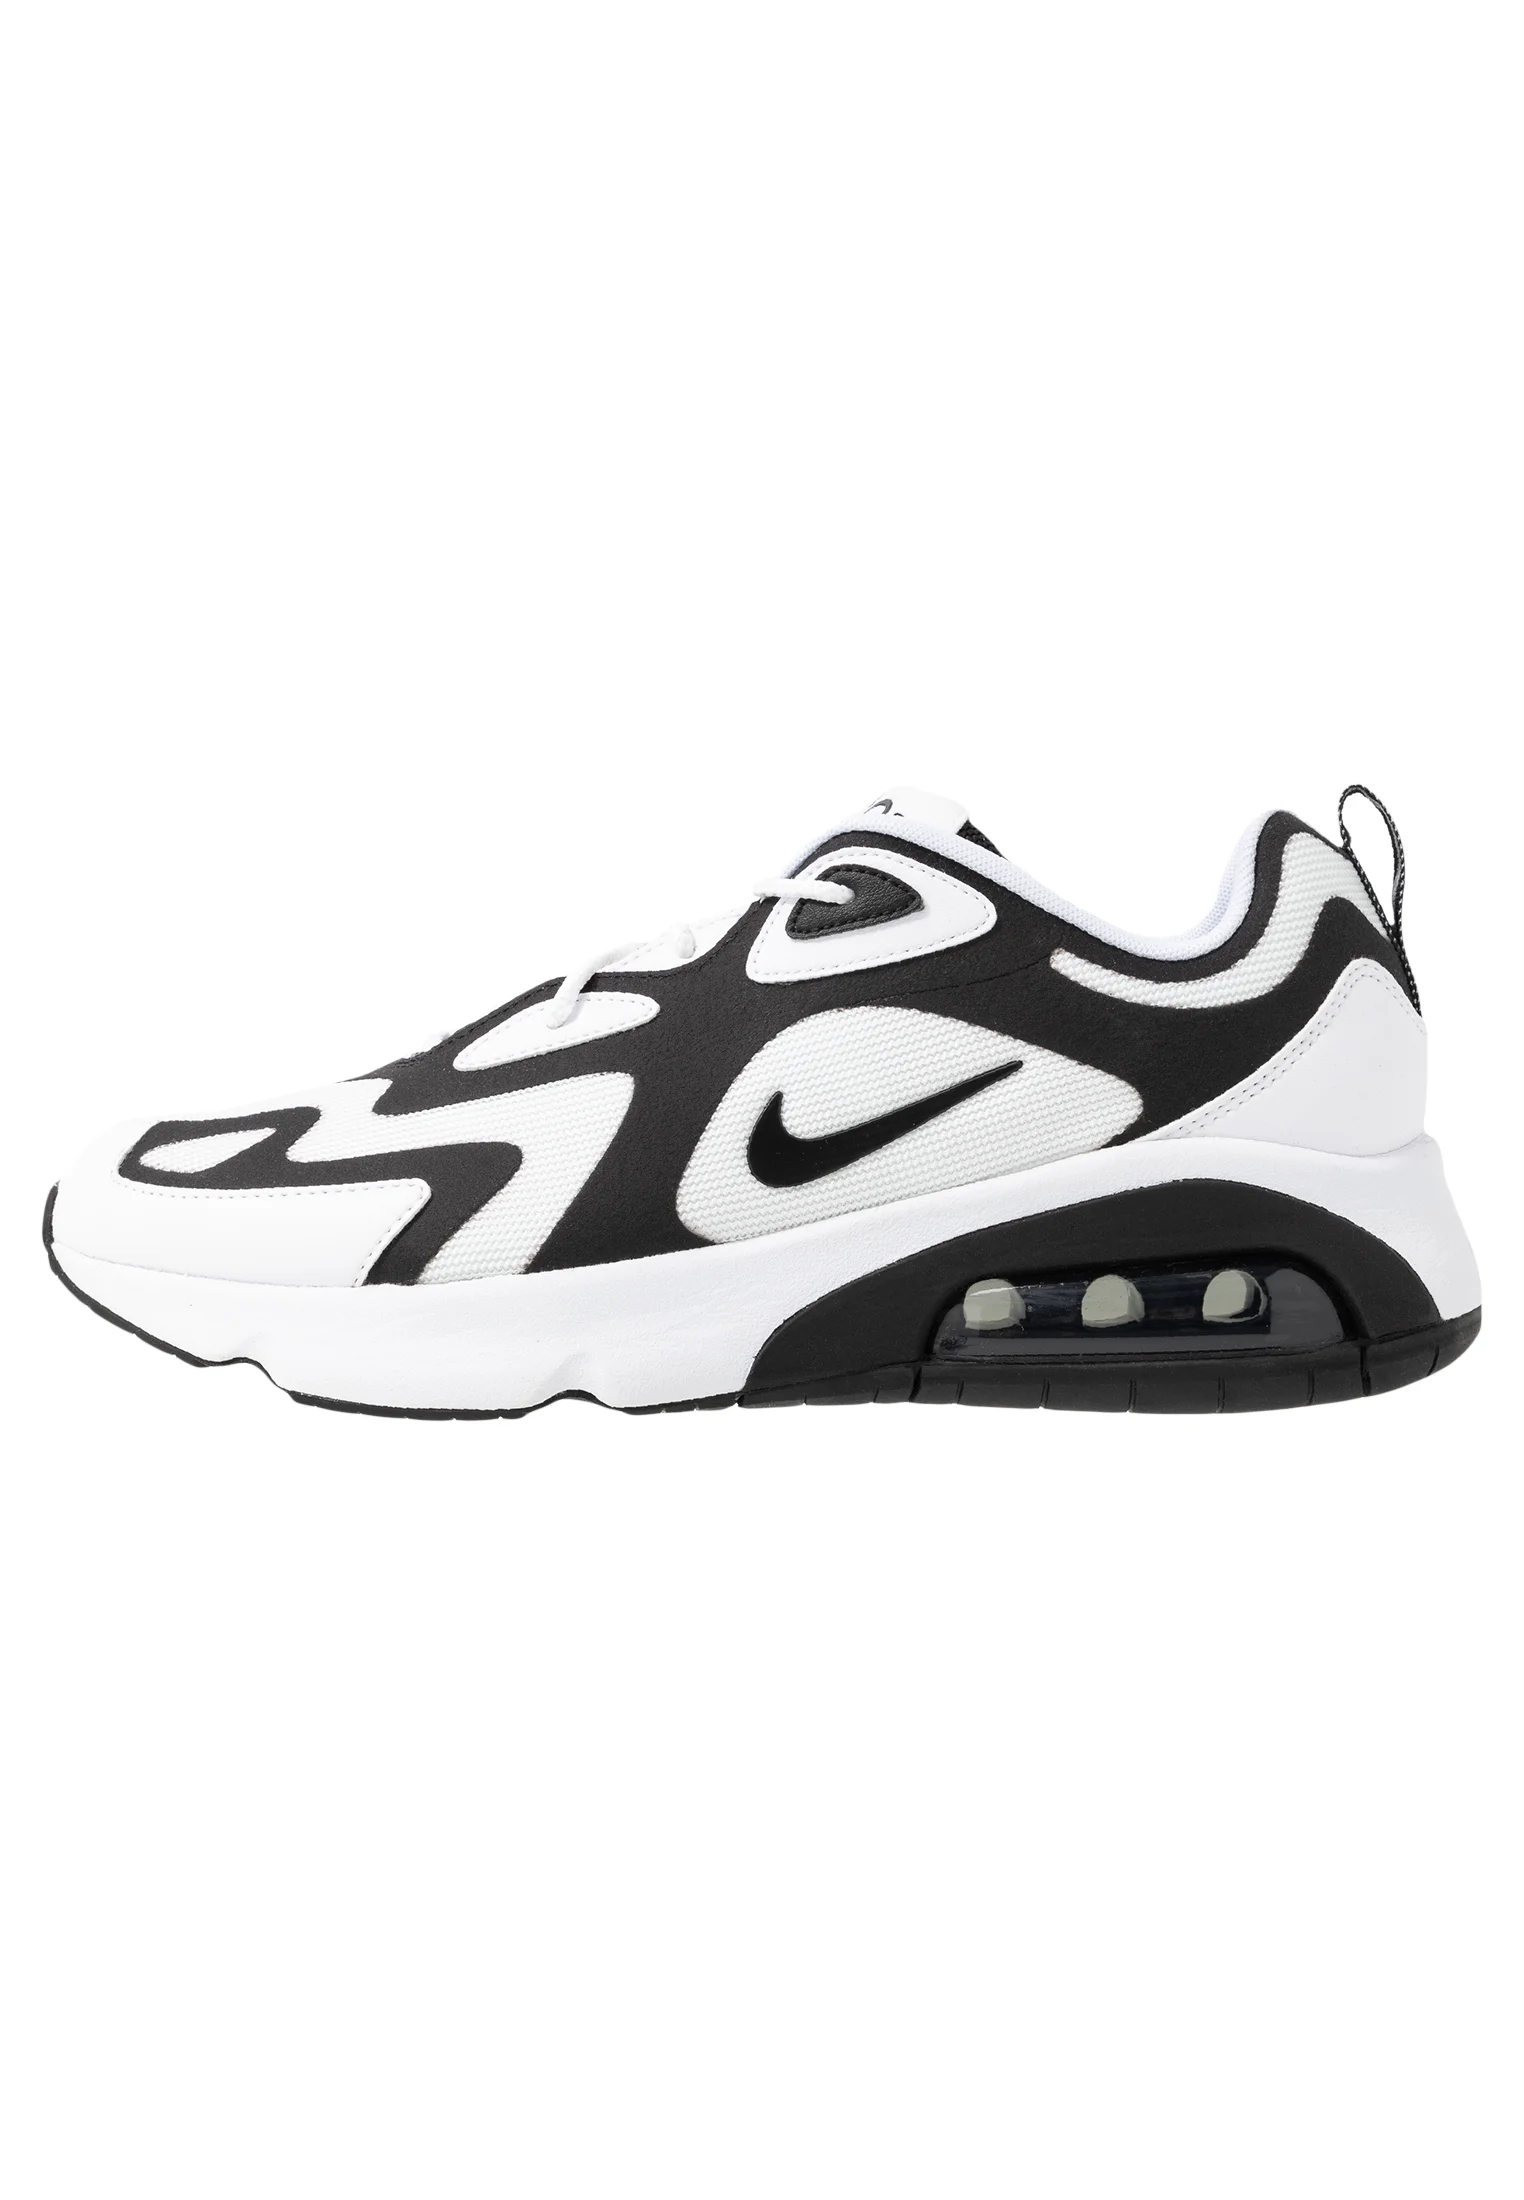 nike sportswear air max 200 sneaker